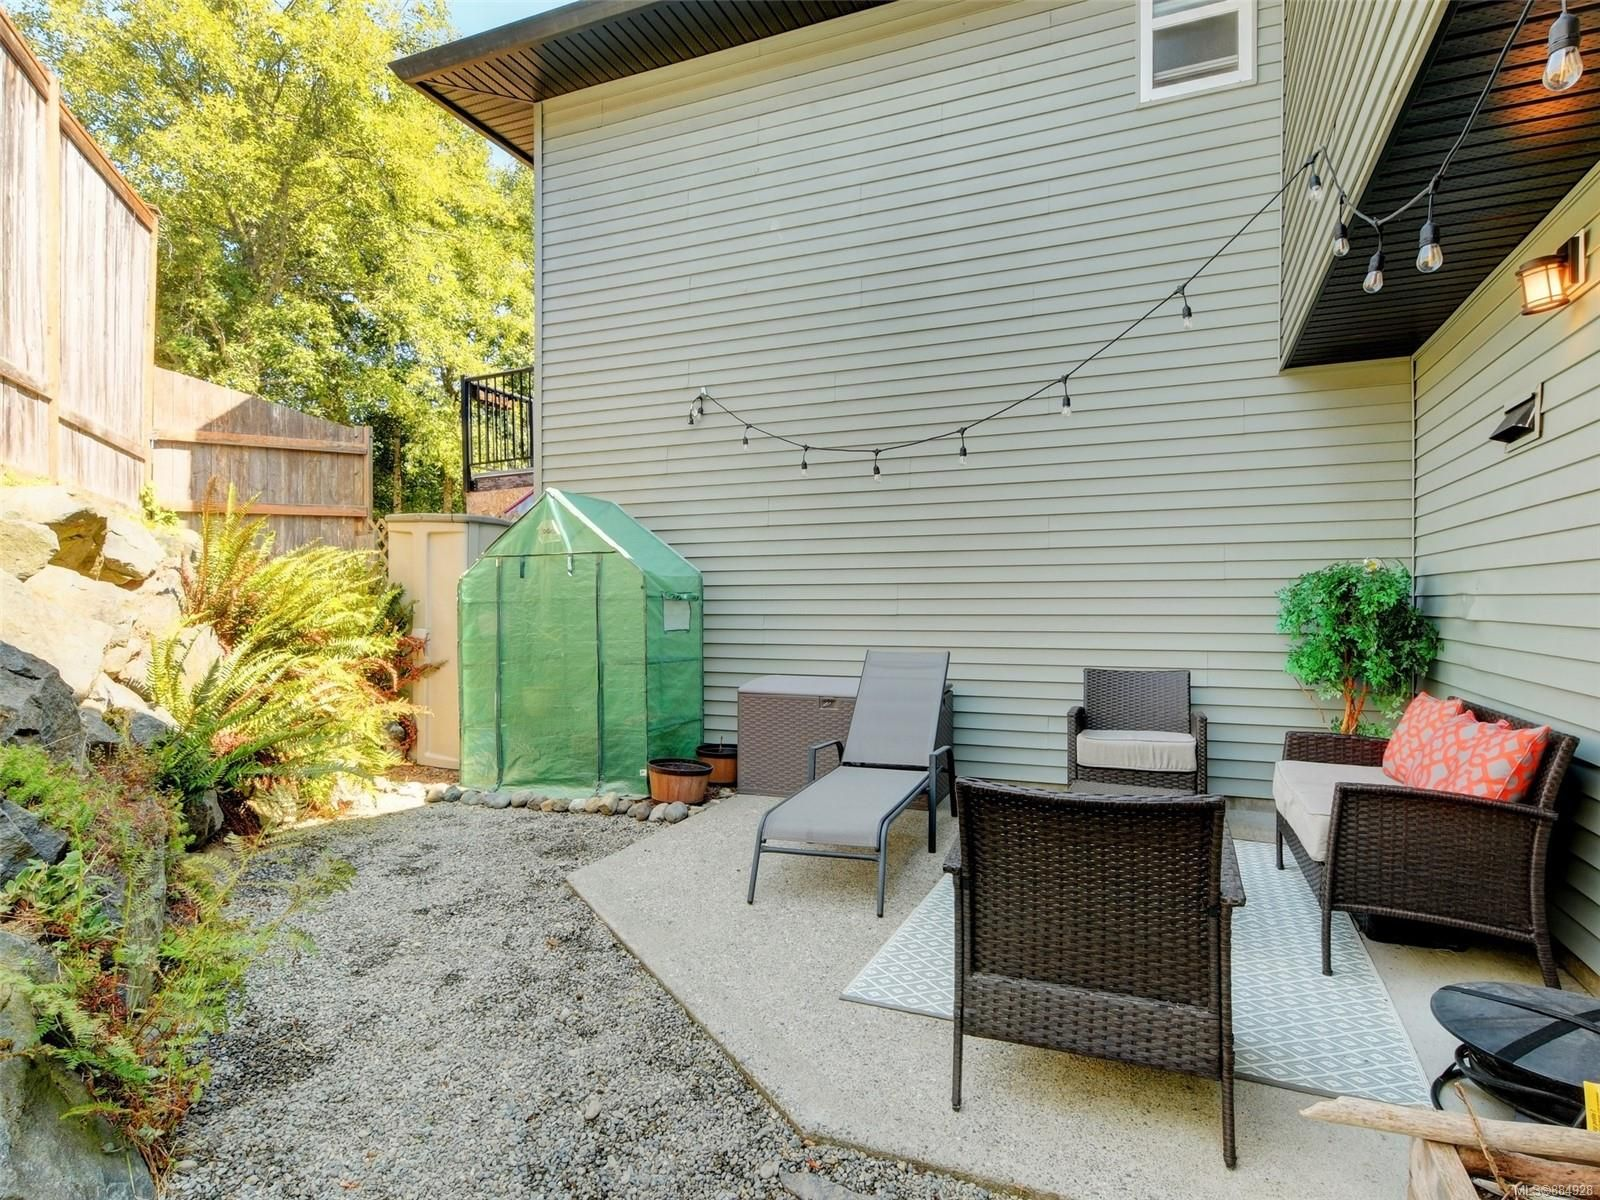 Photo 22: Photos: 6896 Beaton Rd in : Sk Broomhill Half Duplex for sale (Sooke)  : MLS®# 884928